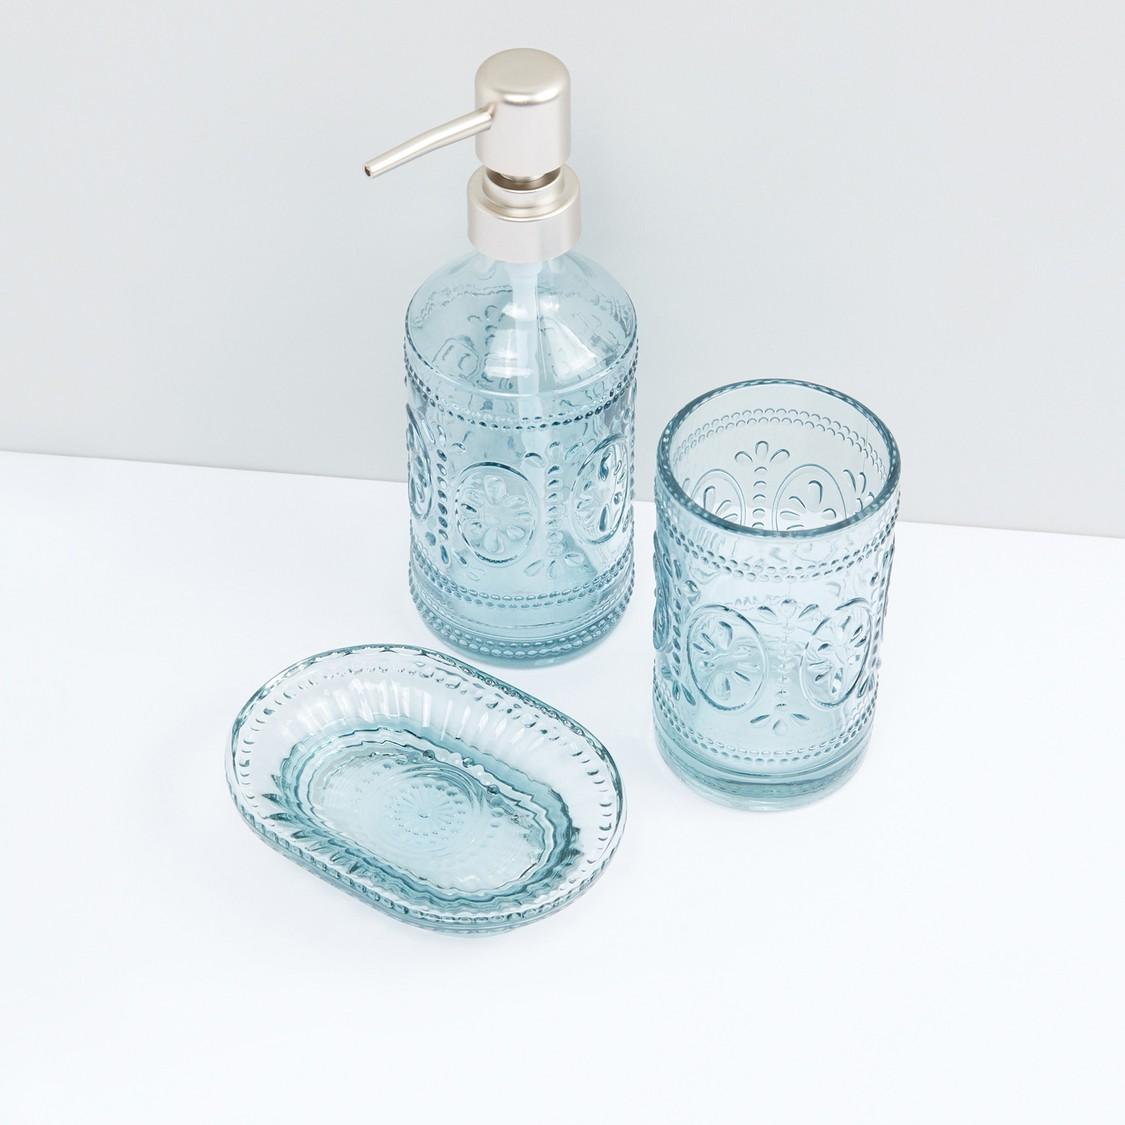 Decorative Bath Set